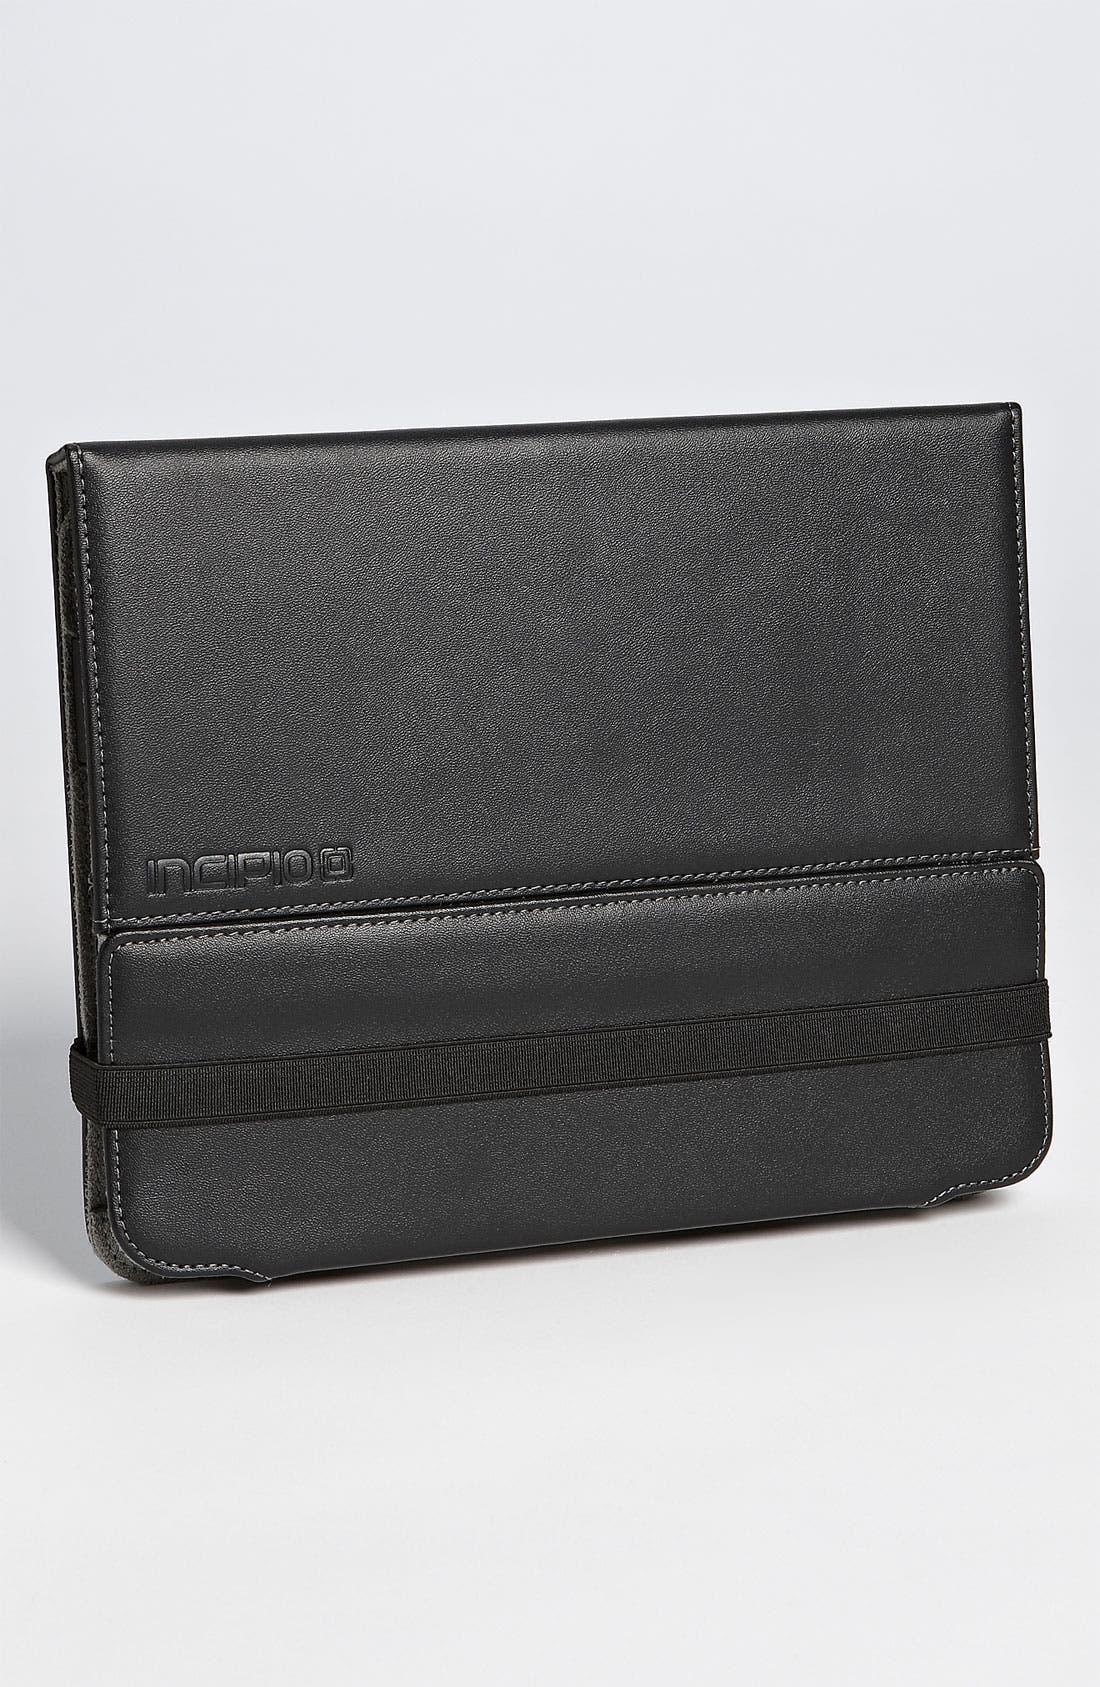 Alternate Image 1 Selected - Incipio 'Executive Premium Kickstand' iPad 2 Case